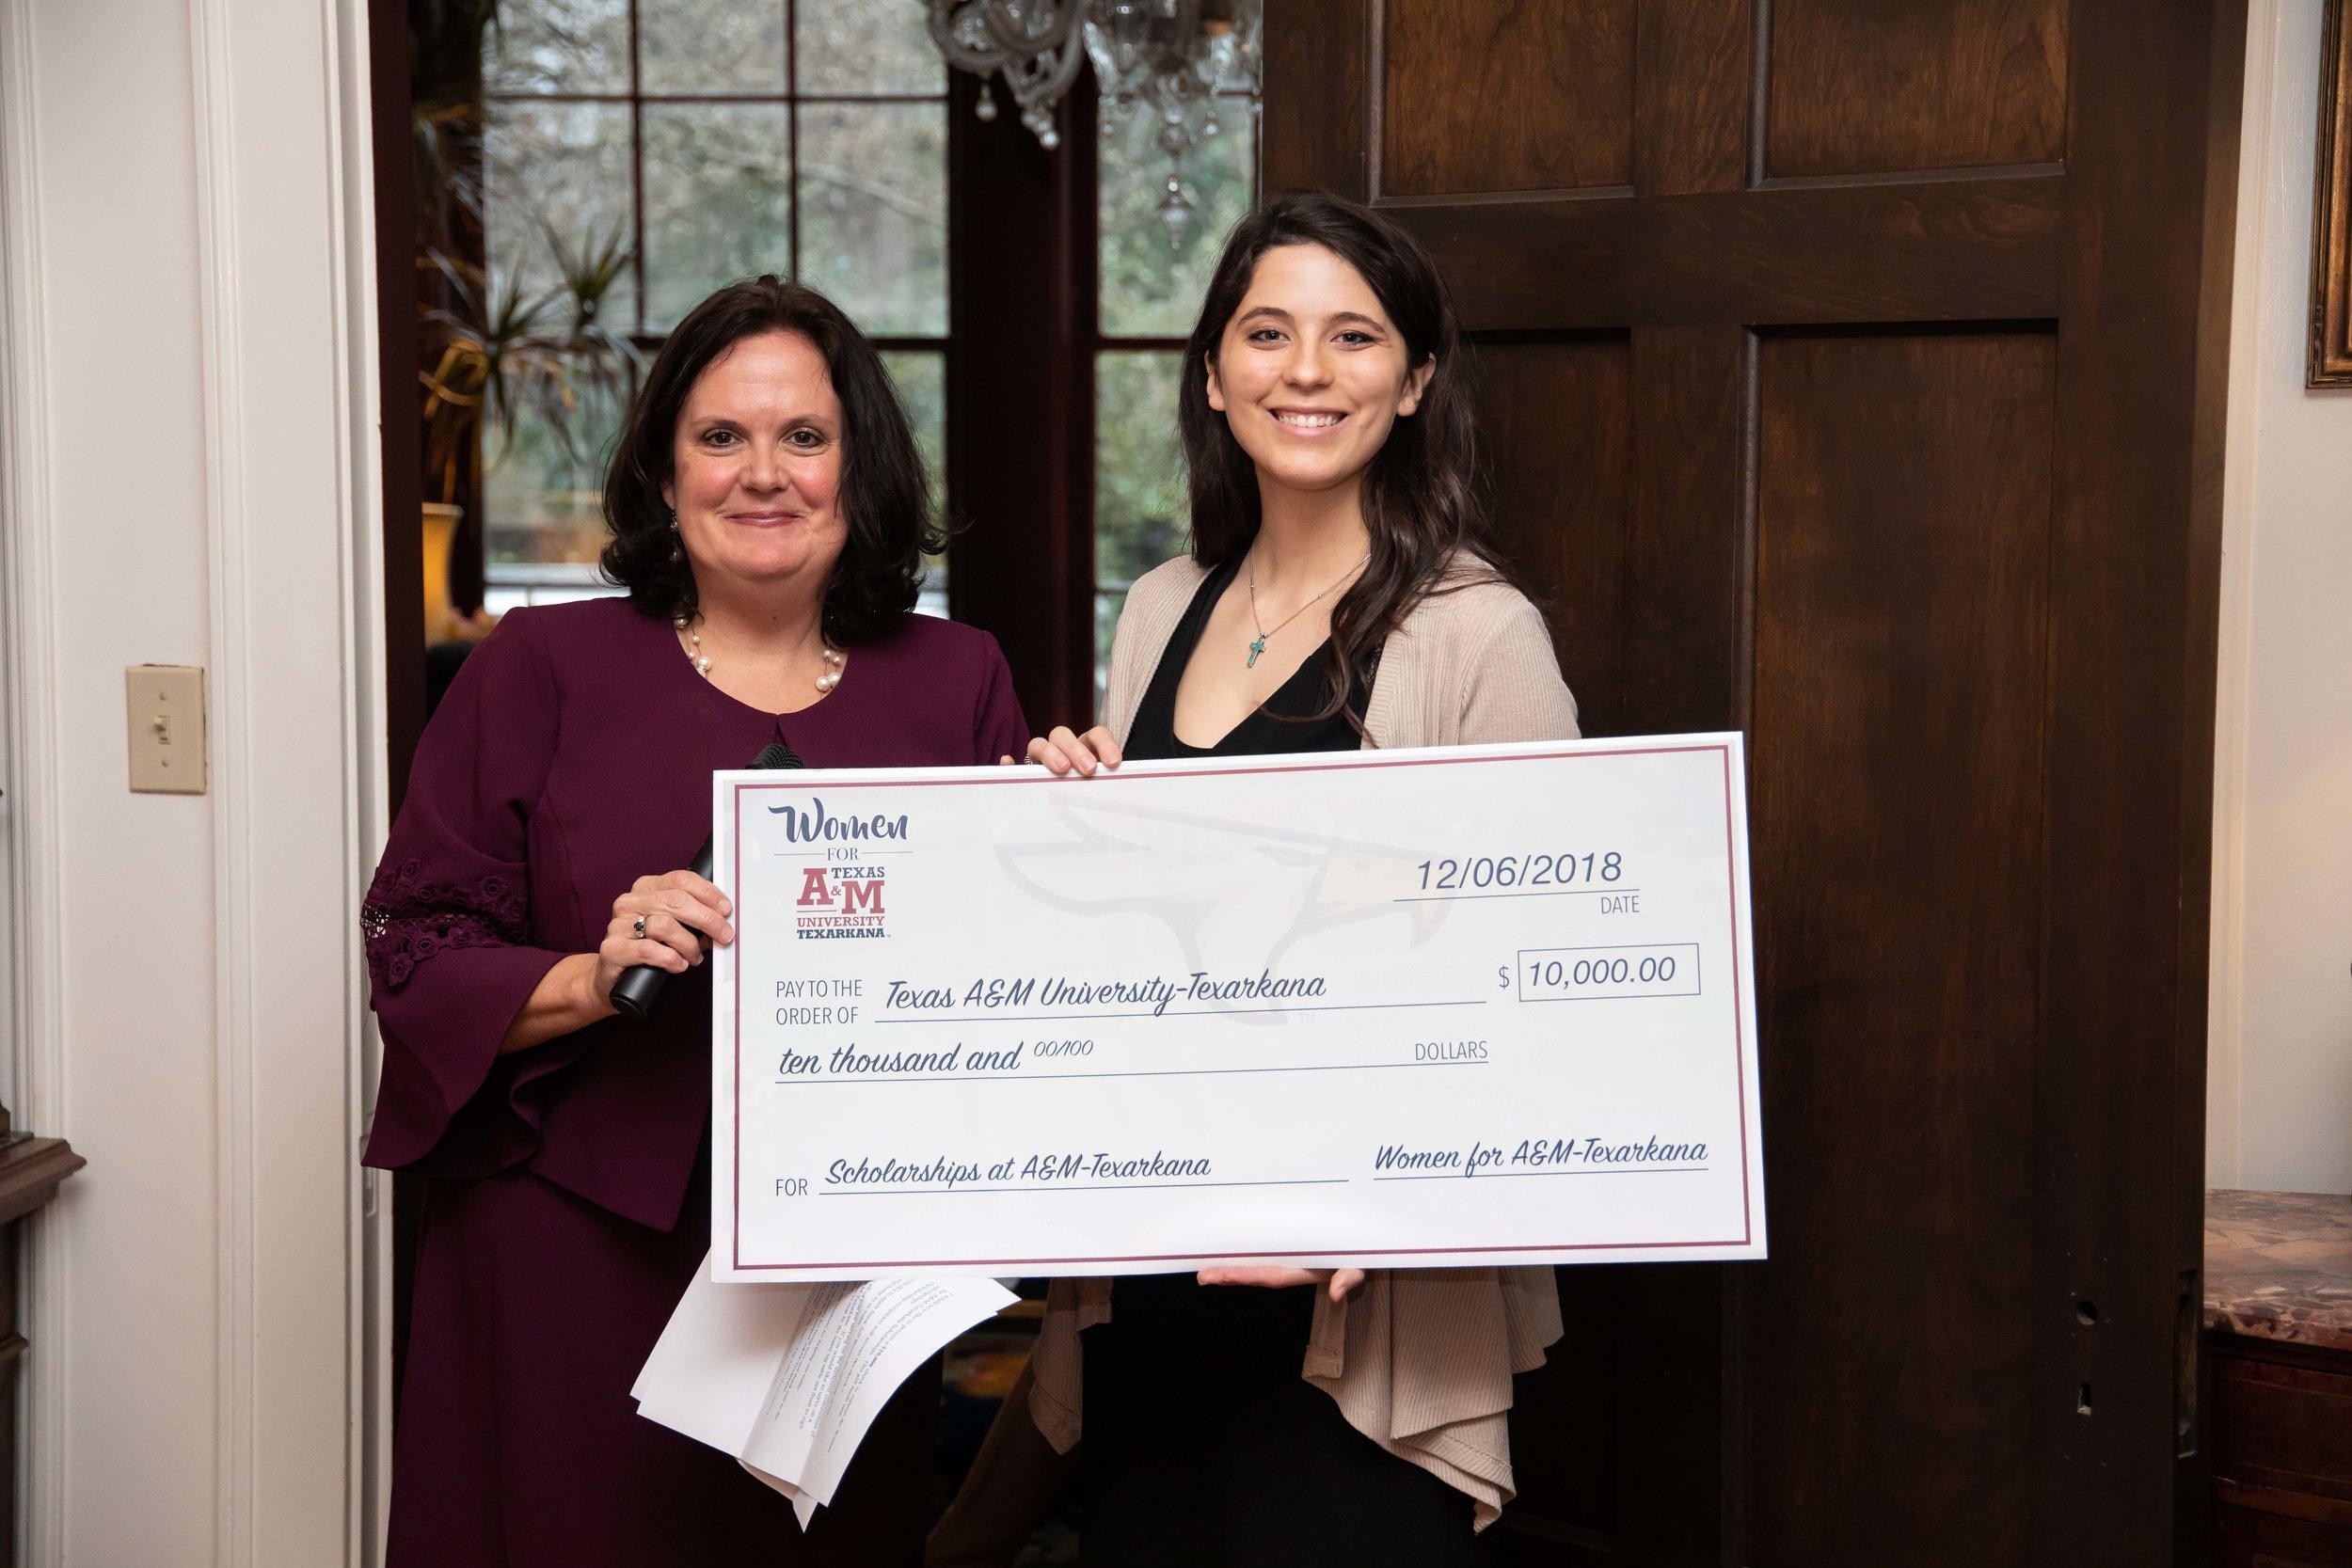 Virginia Trammell, Women for A&M-Texarkana; and Courtney Lebrun, student and scholarship recipient